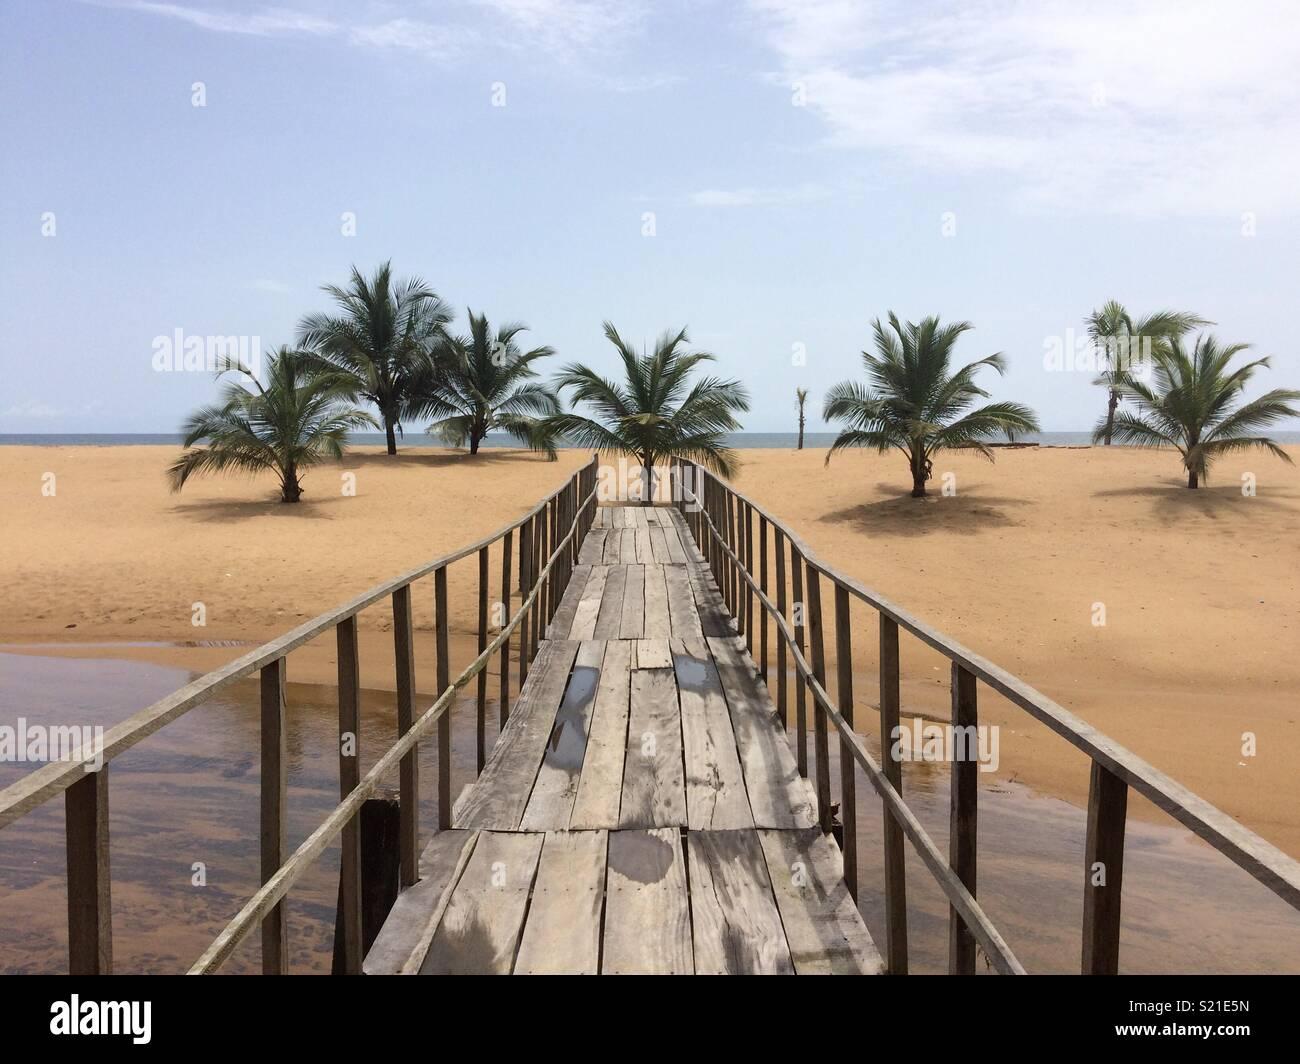 Bridge to paradise - Stock Image